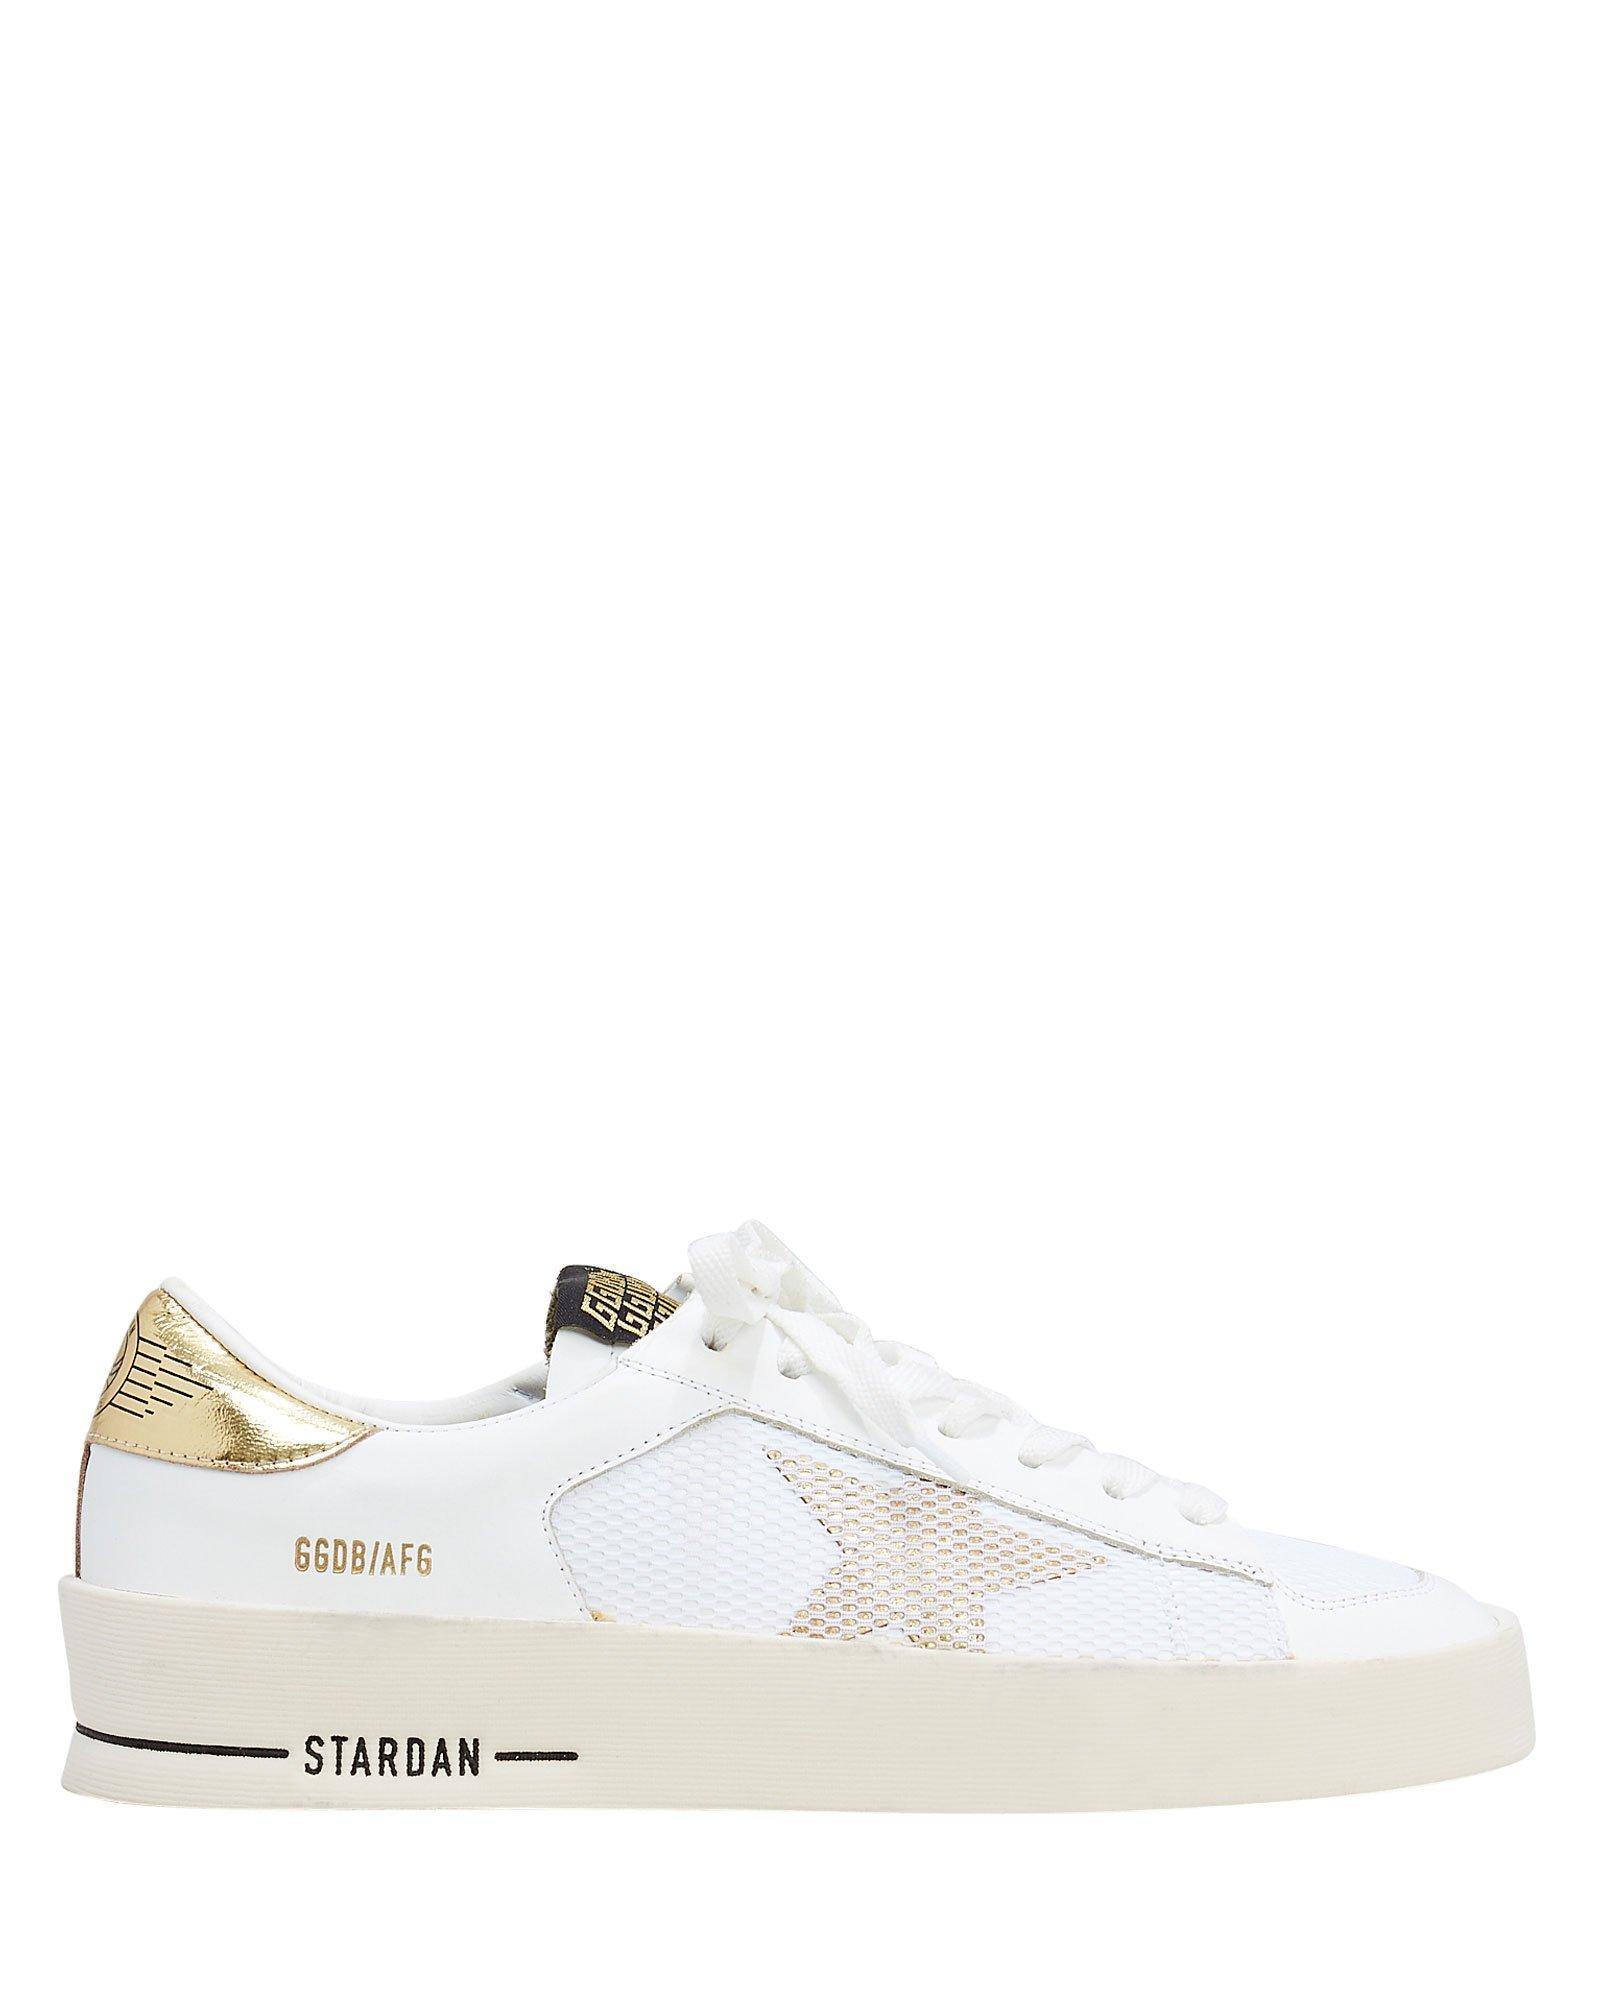 510b7d63f0e1 Star Dan White Leather Sneakers